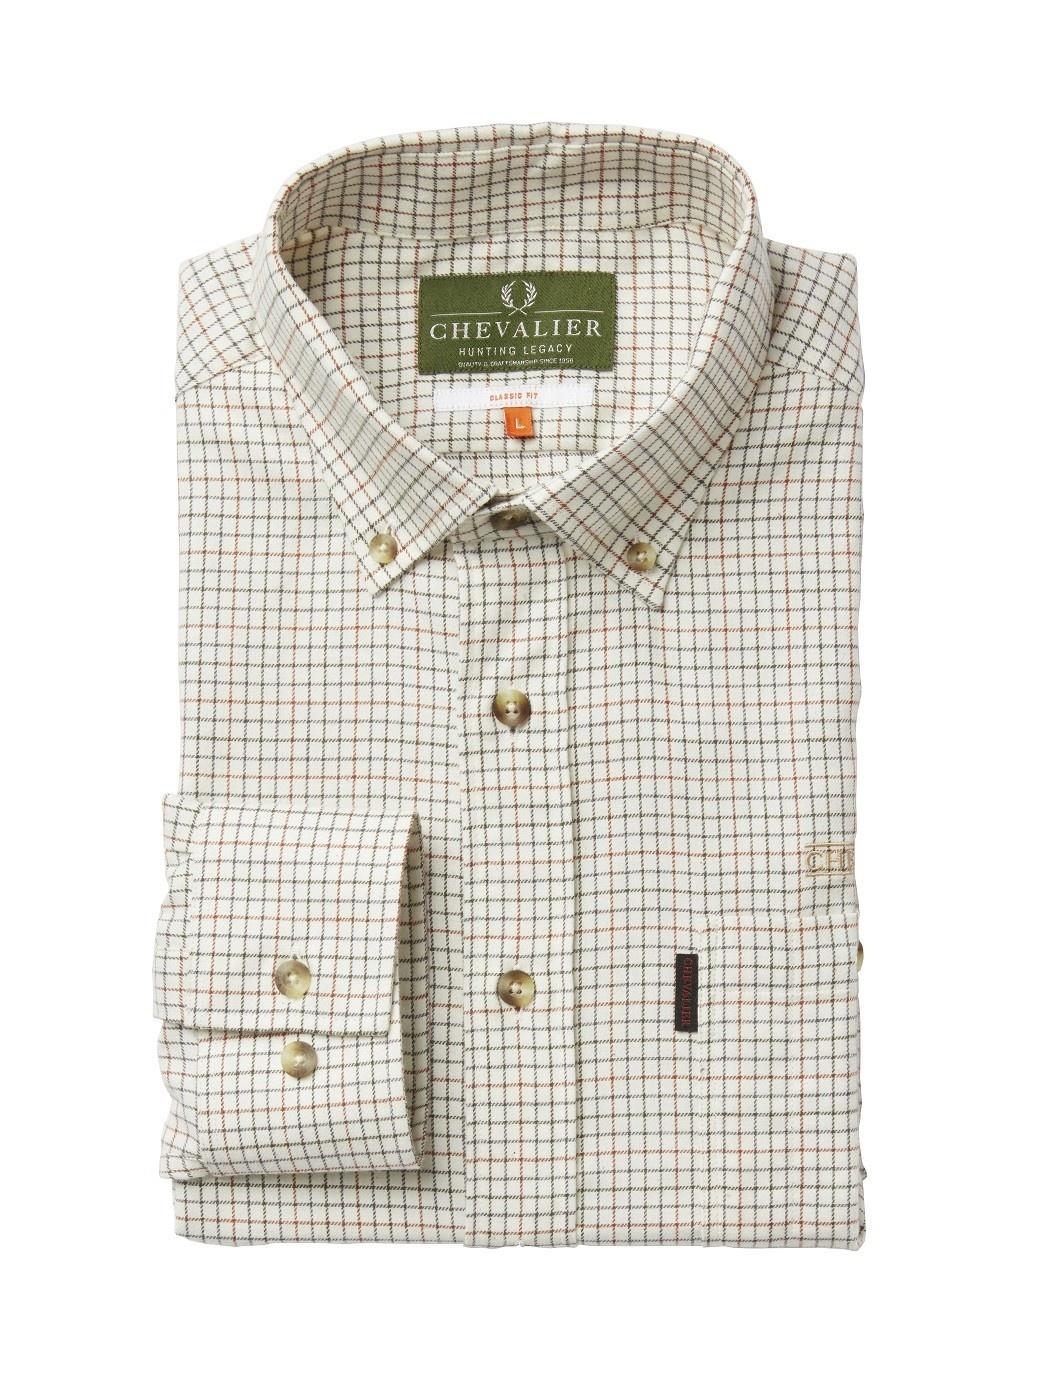 Chevalier Maribor Cotton Wool Shirt BD LS-1